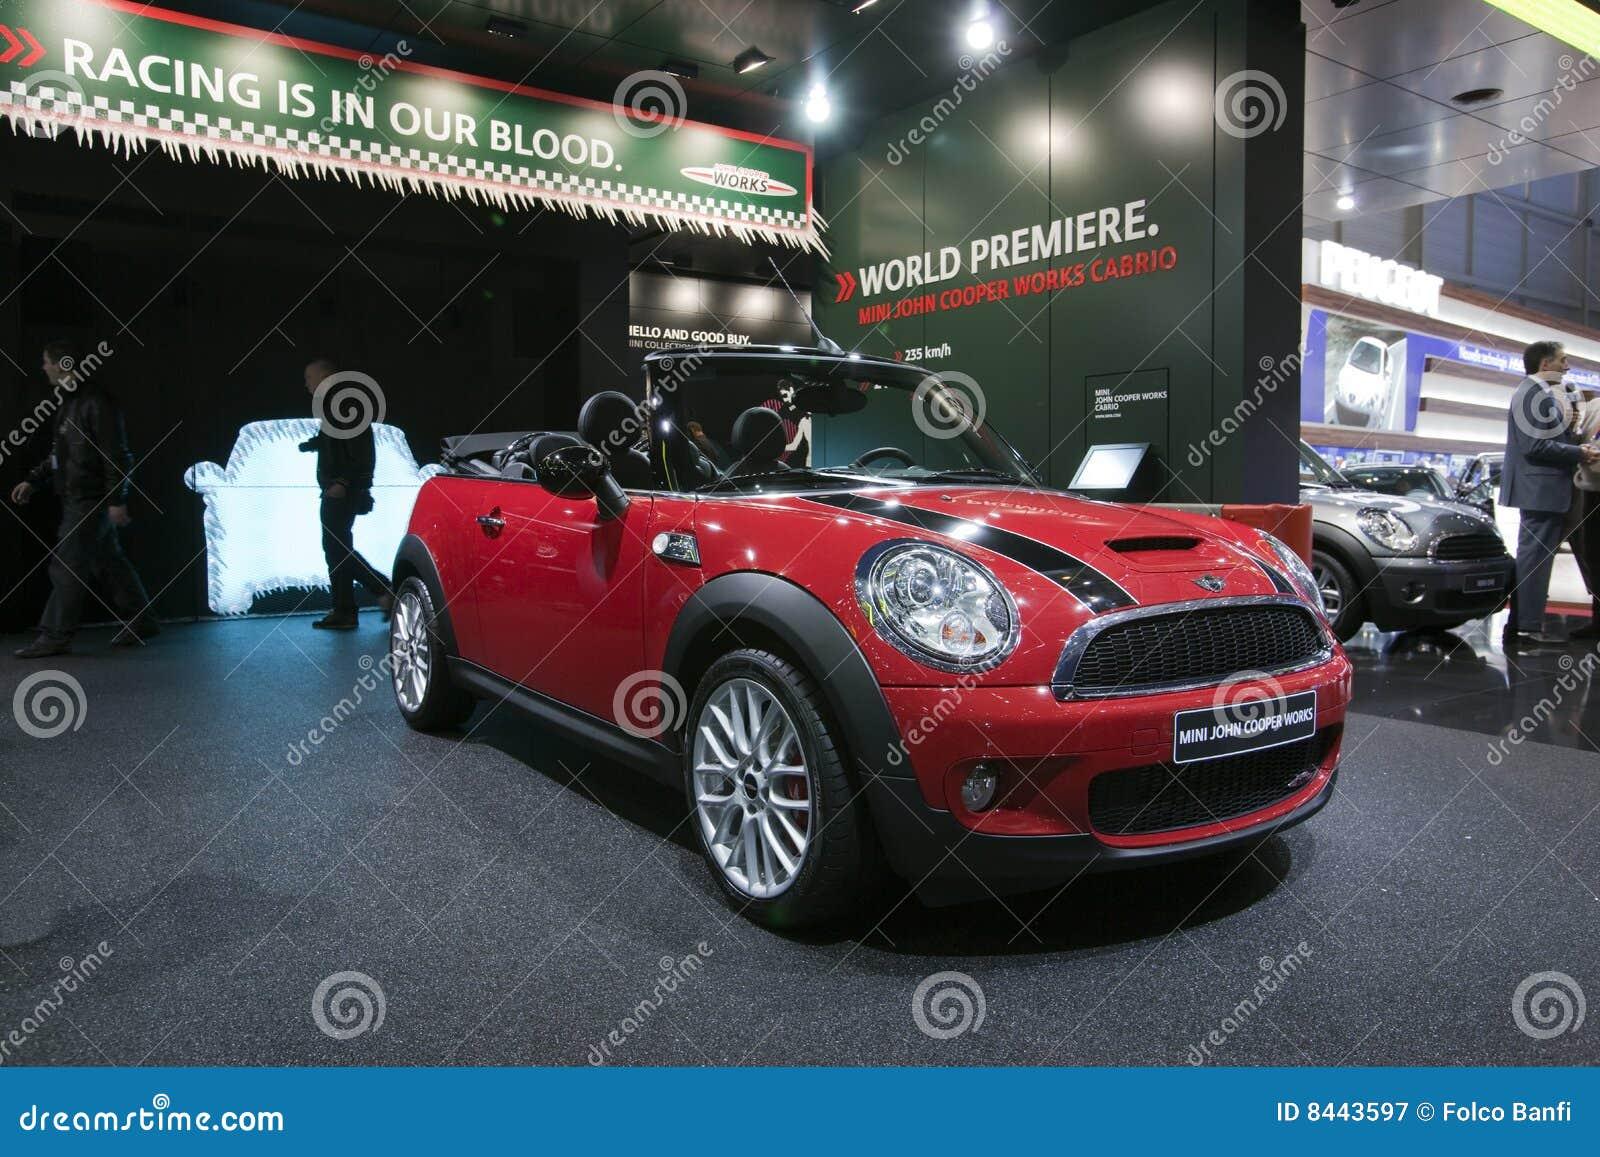 Mini John Cooper Works Cabrio Geneva 2009 Editorial Photography